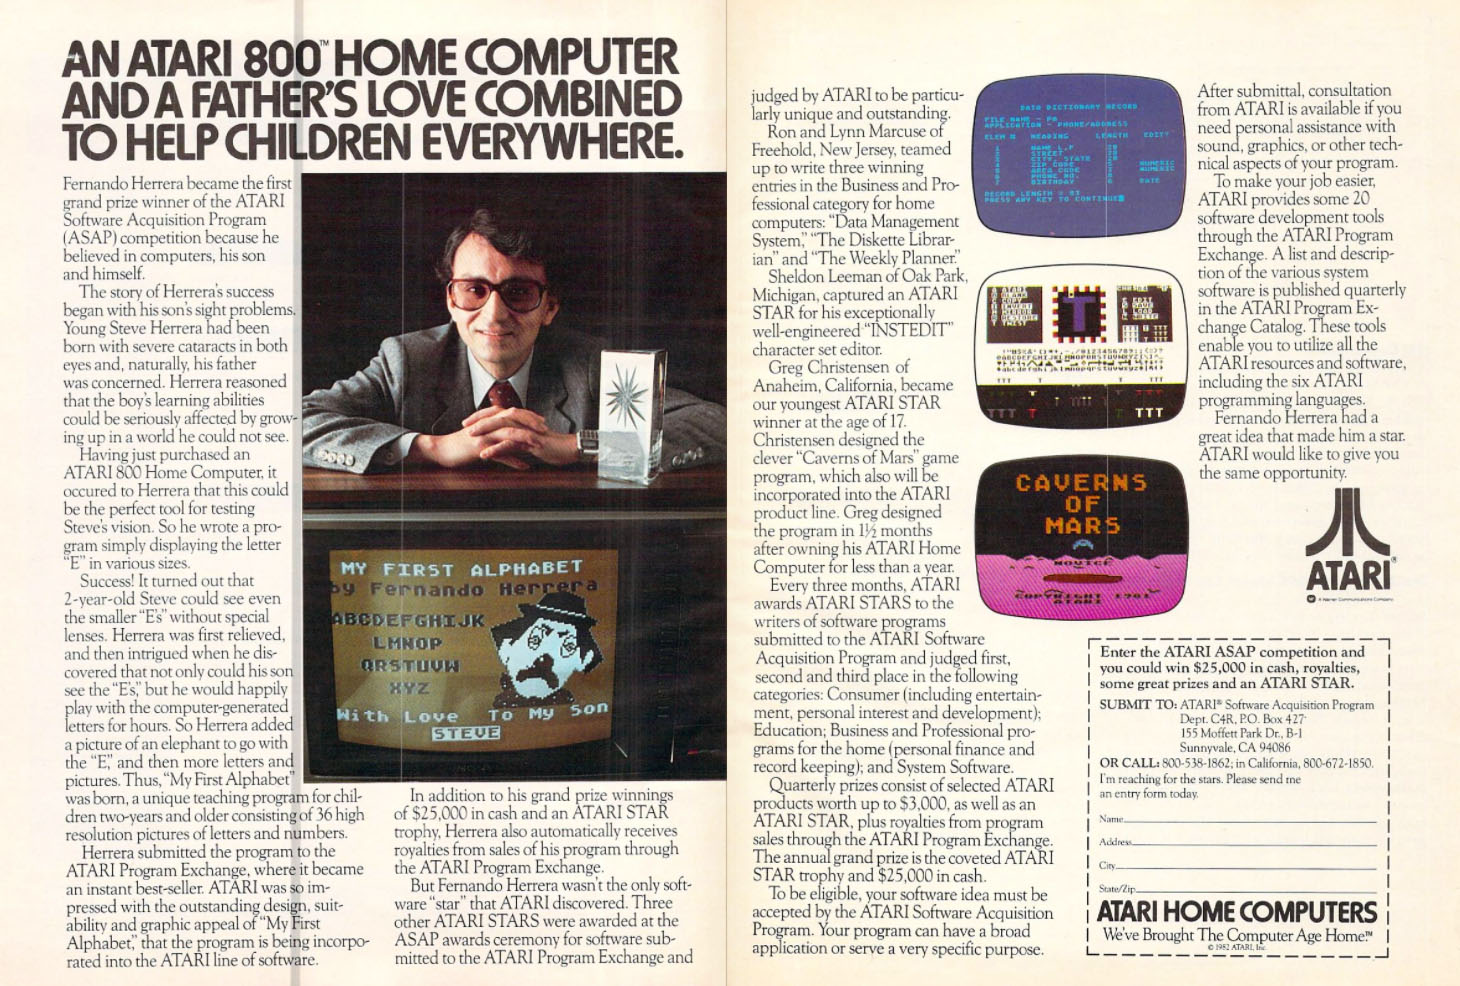 Atari 800 Home Computer, 1982